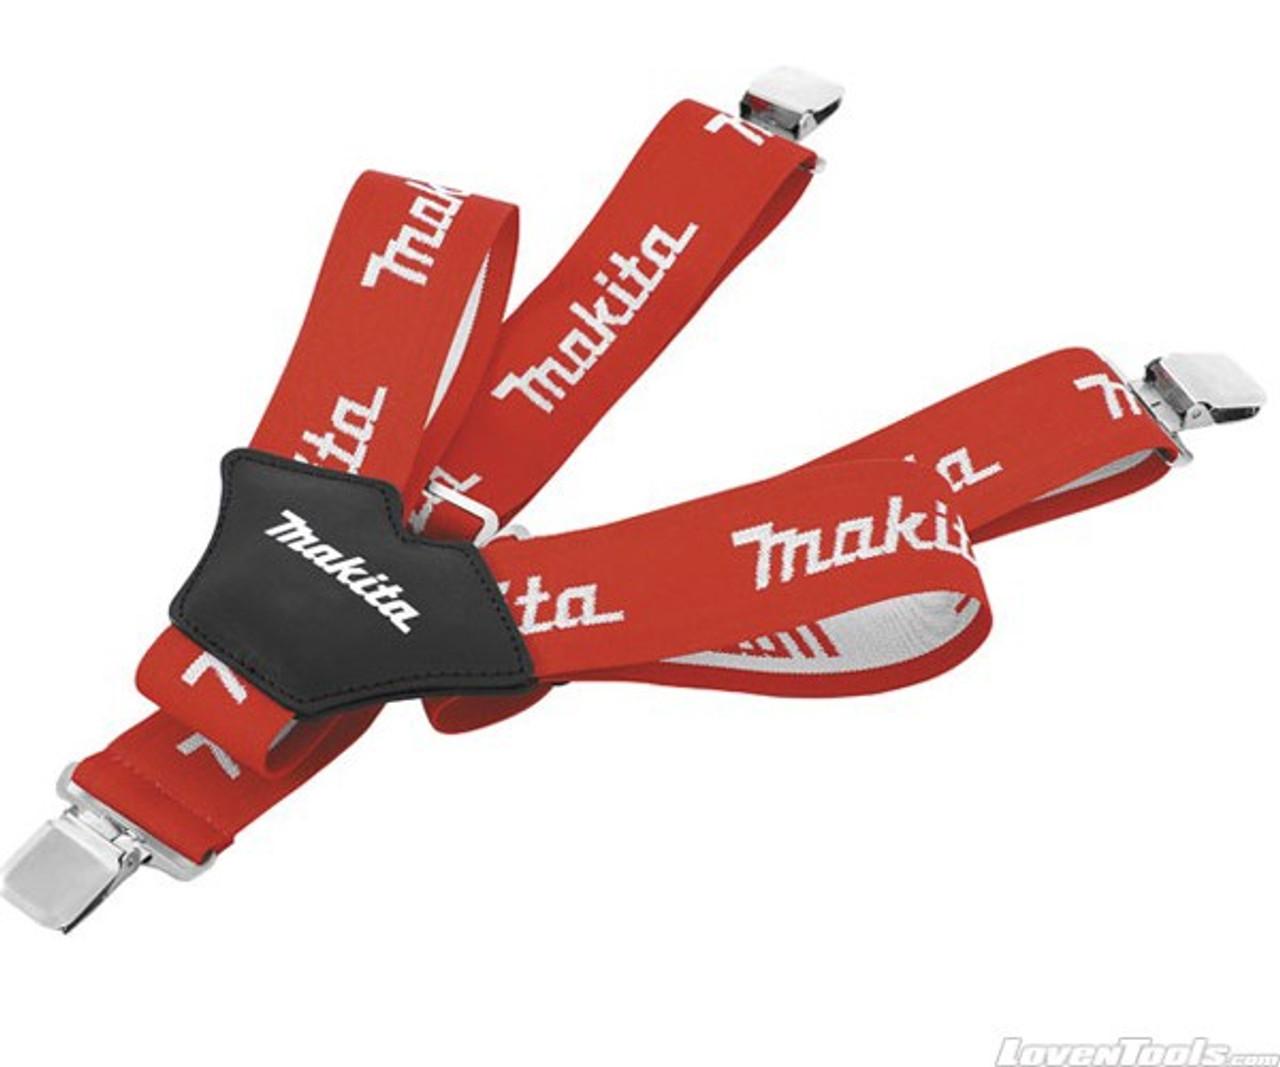 P-72176 Makita braces with clip